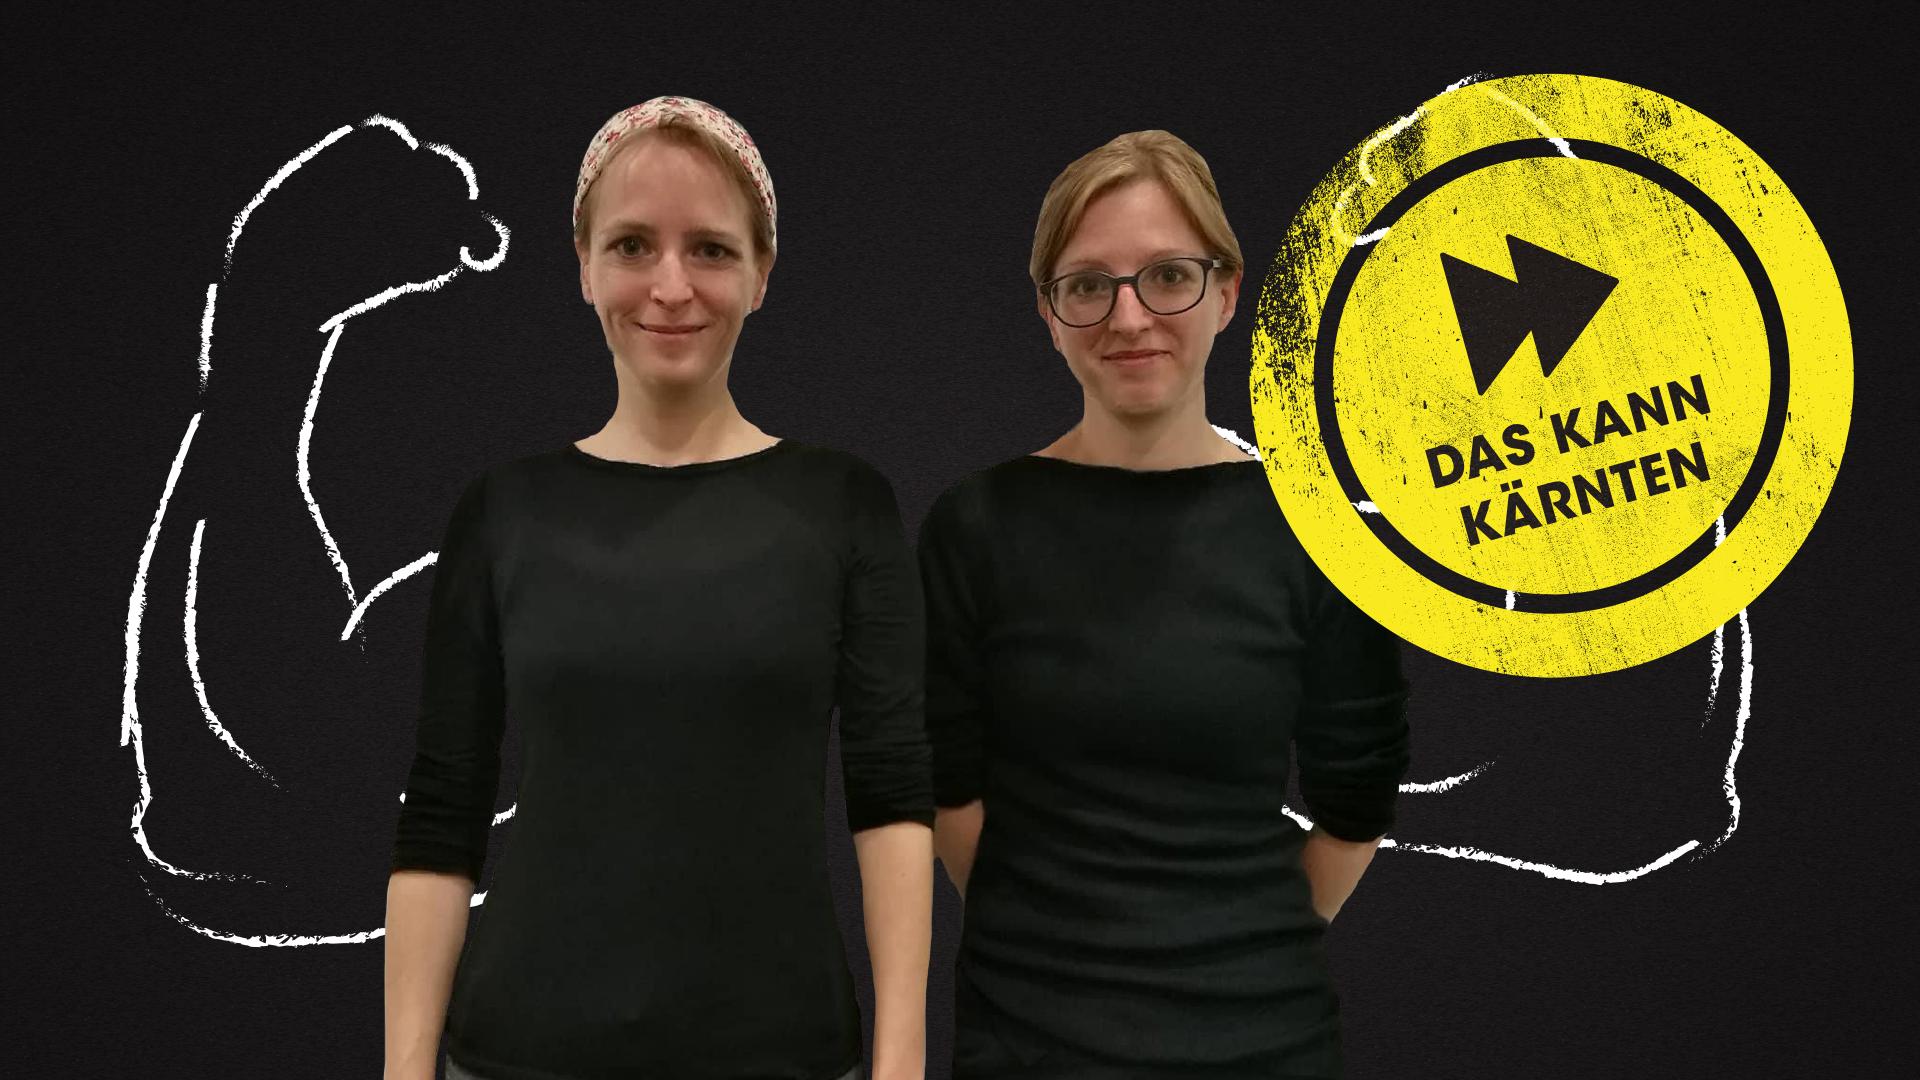 Mann sucht Frau Kttmannsdorf | Locanto Casual Dating